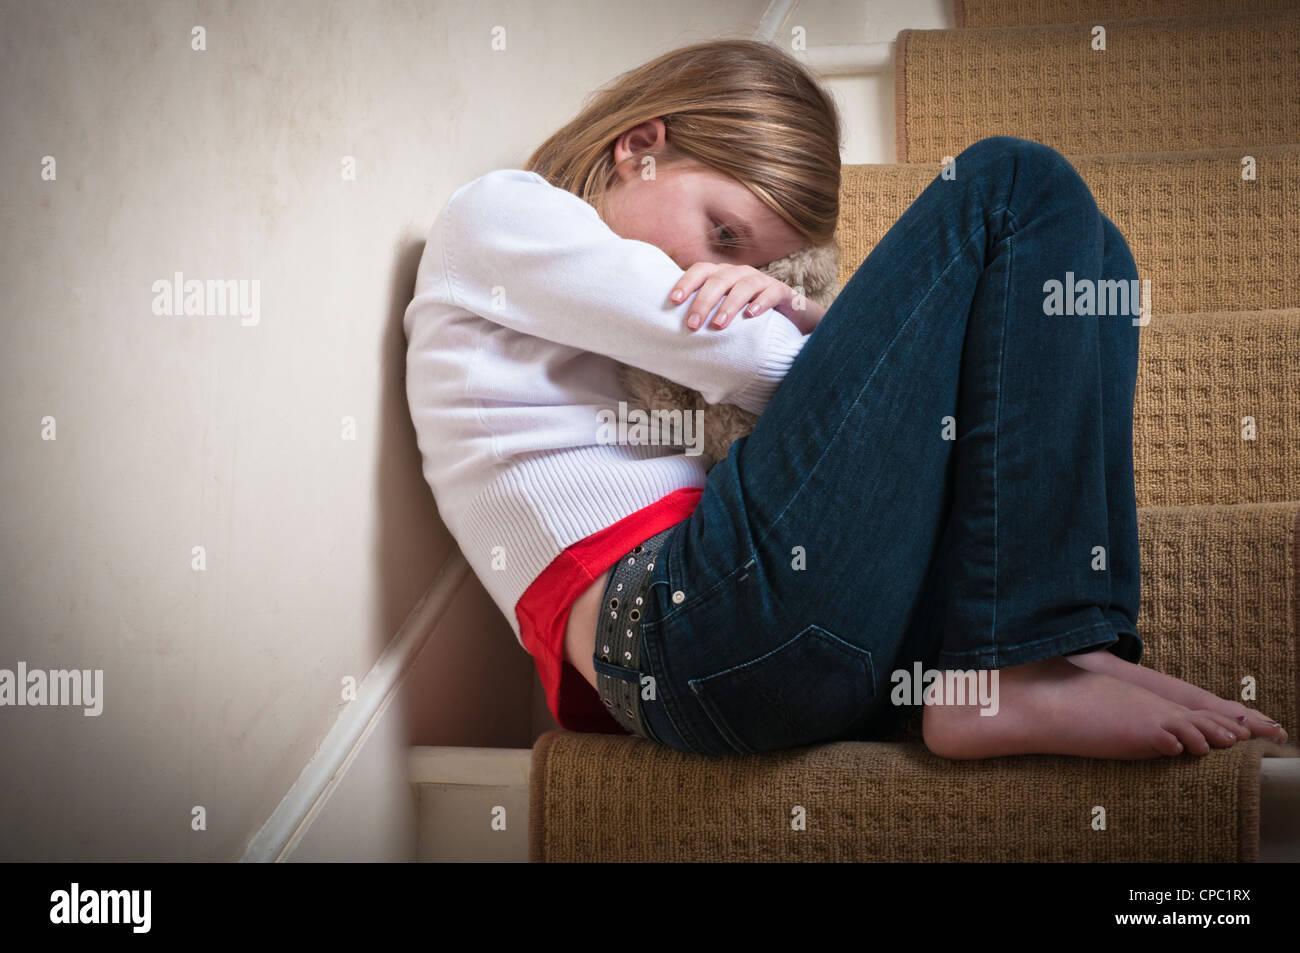 Child neglect - Stock Image